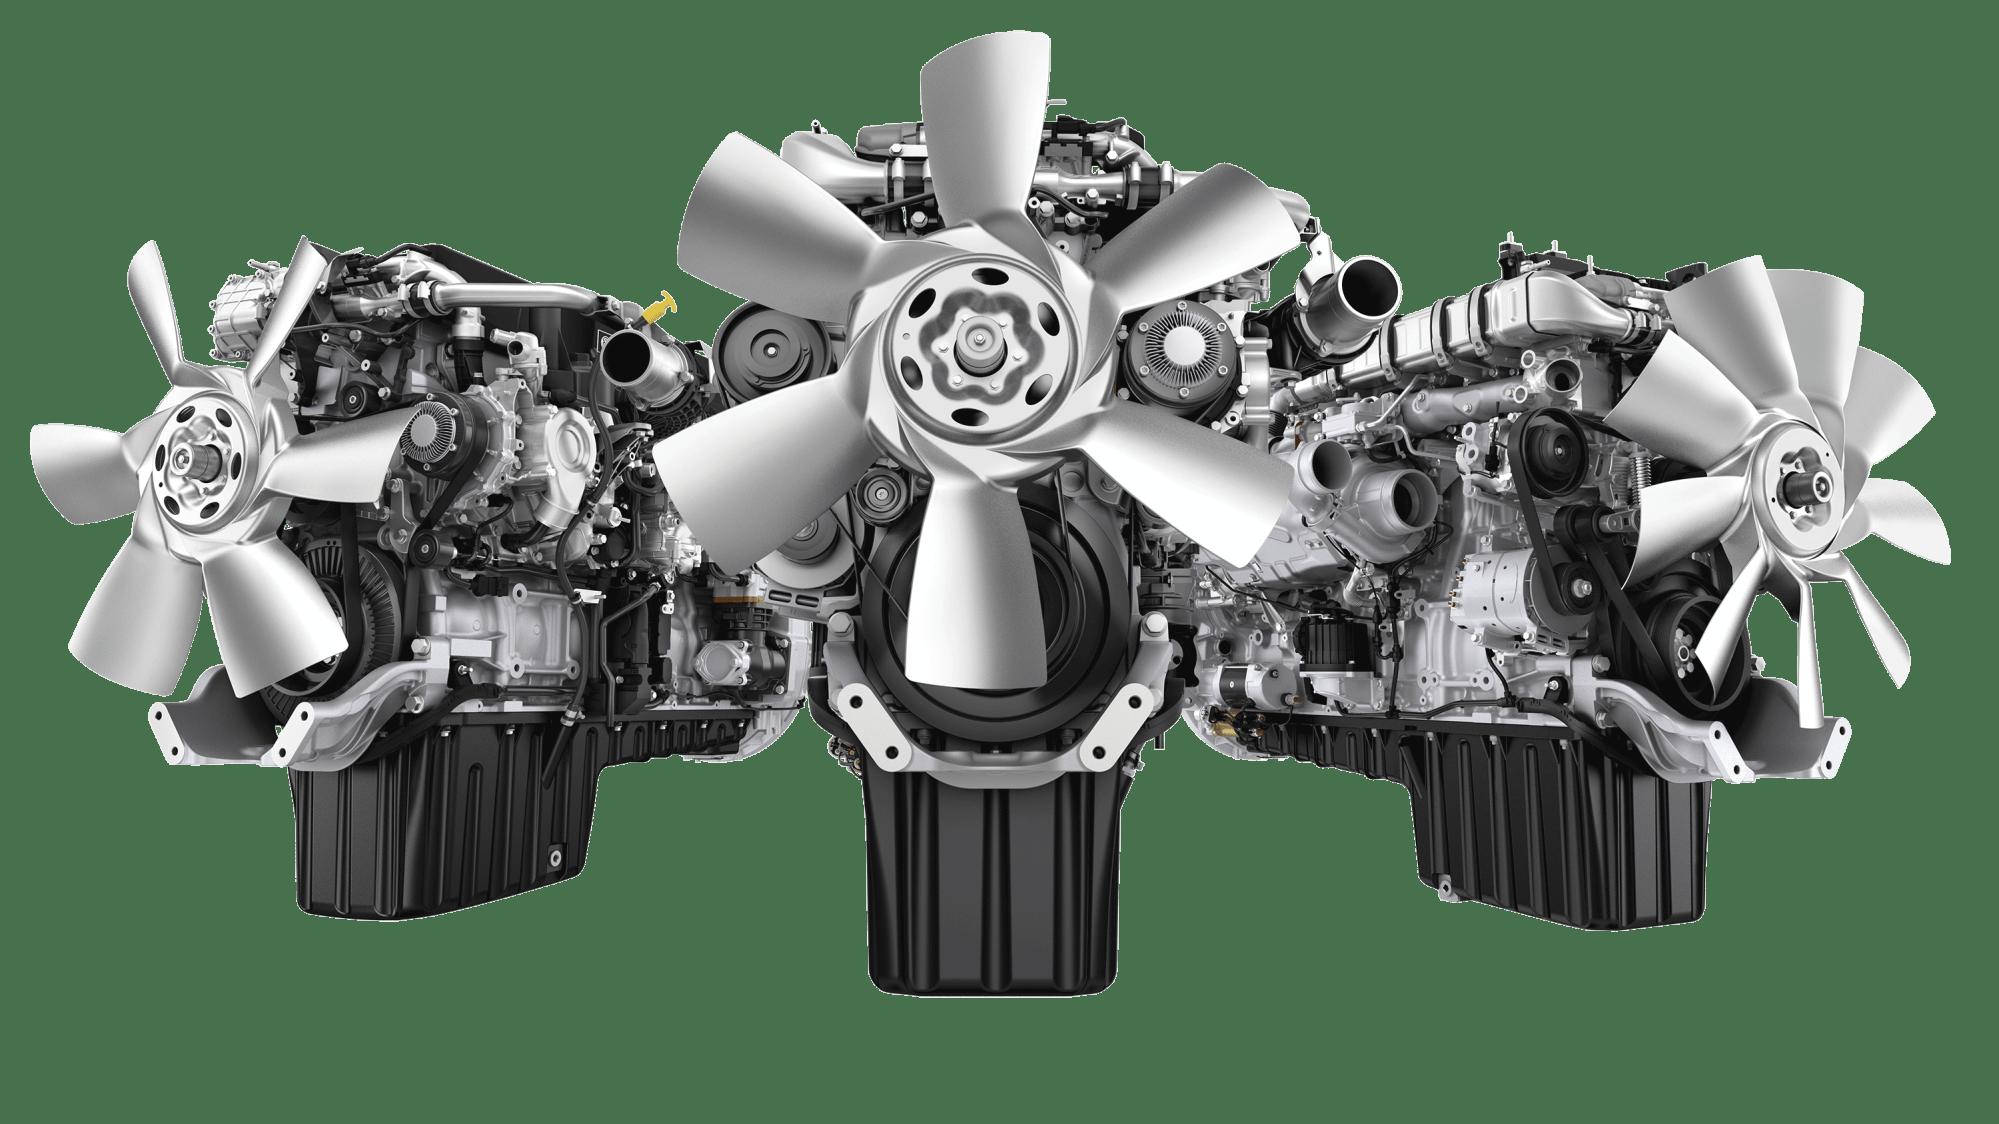 hight resolution of detroit engines trinity image